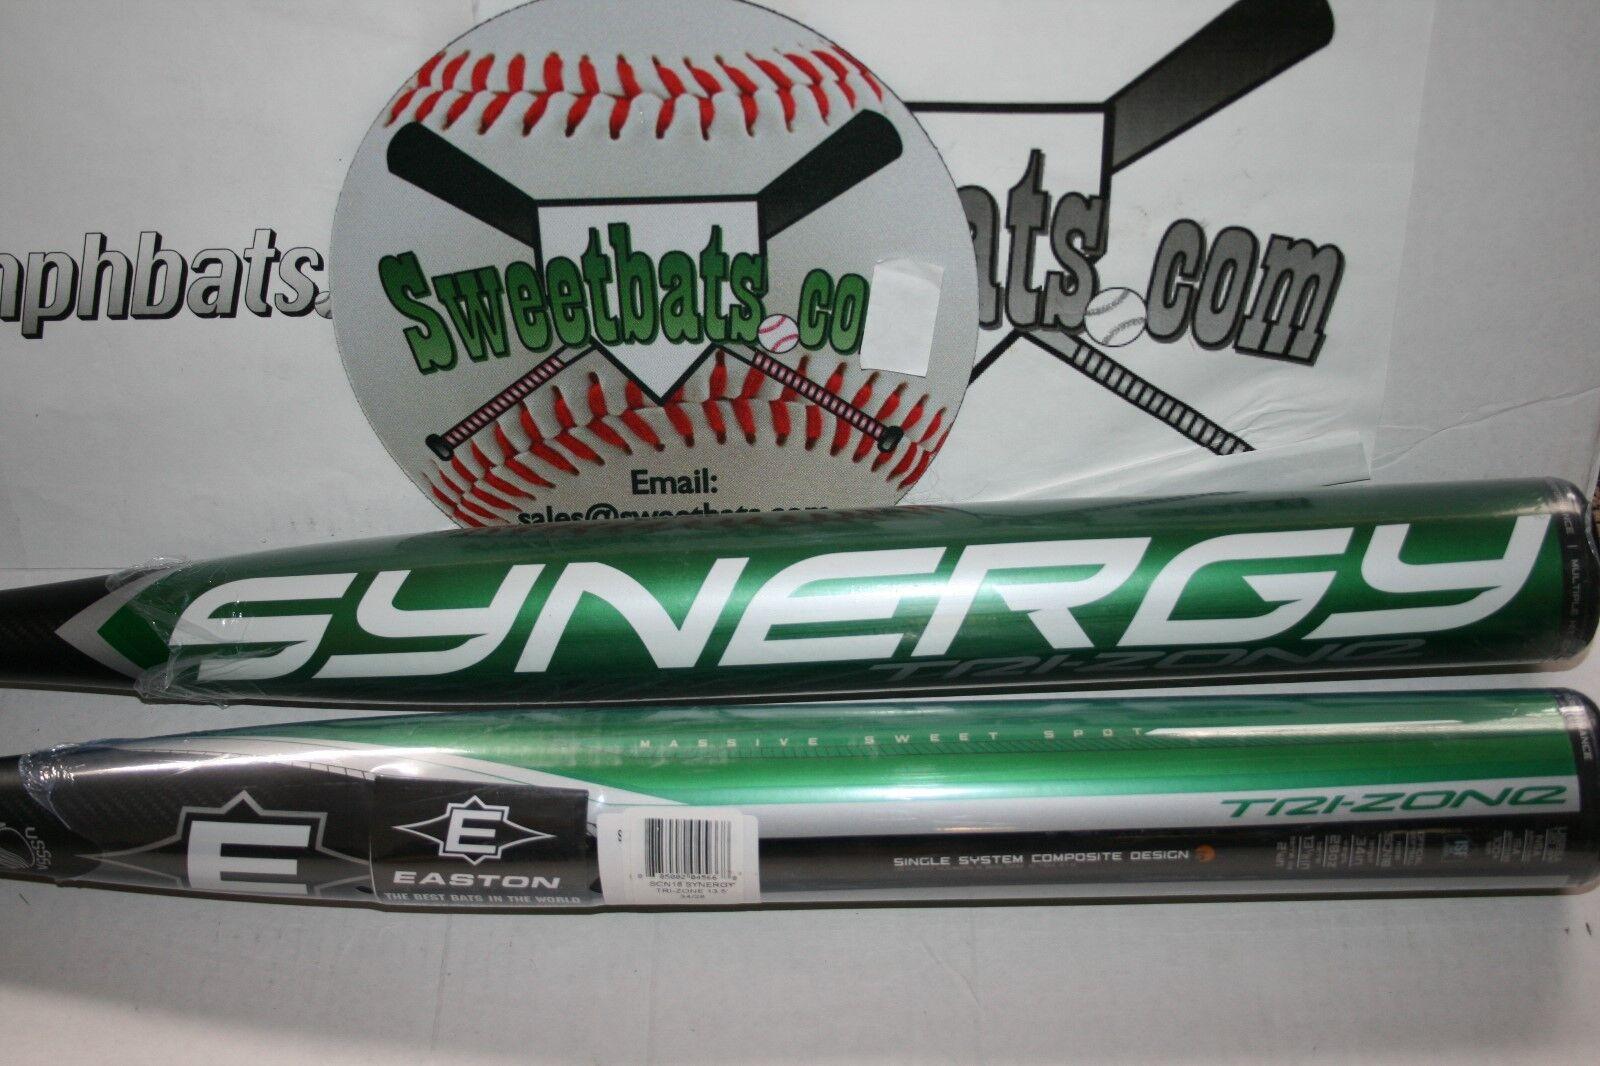 New New New Easton Synergy SCN18 TRI ZONE USSSA Softball Bat 28 100mph + 13.5  barrel d4dbd5